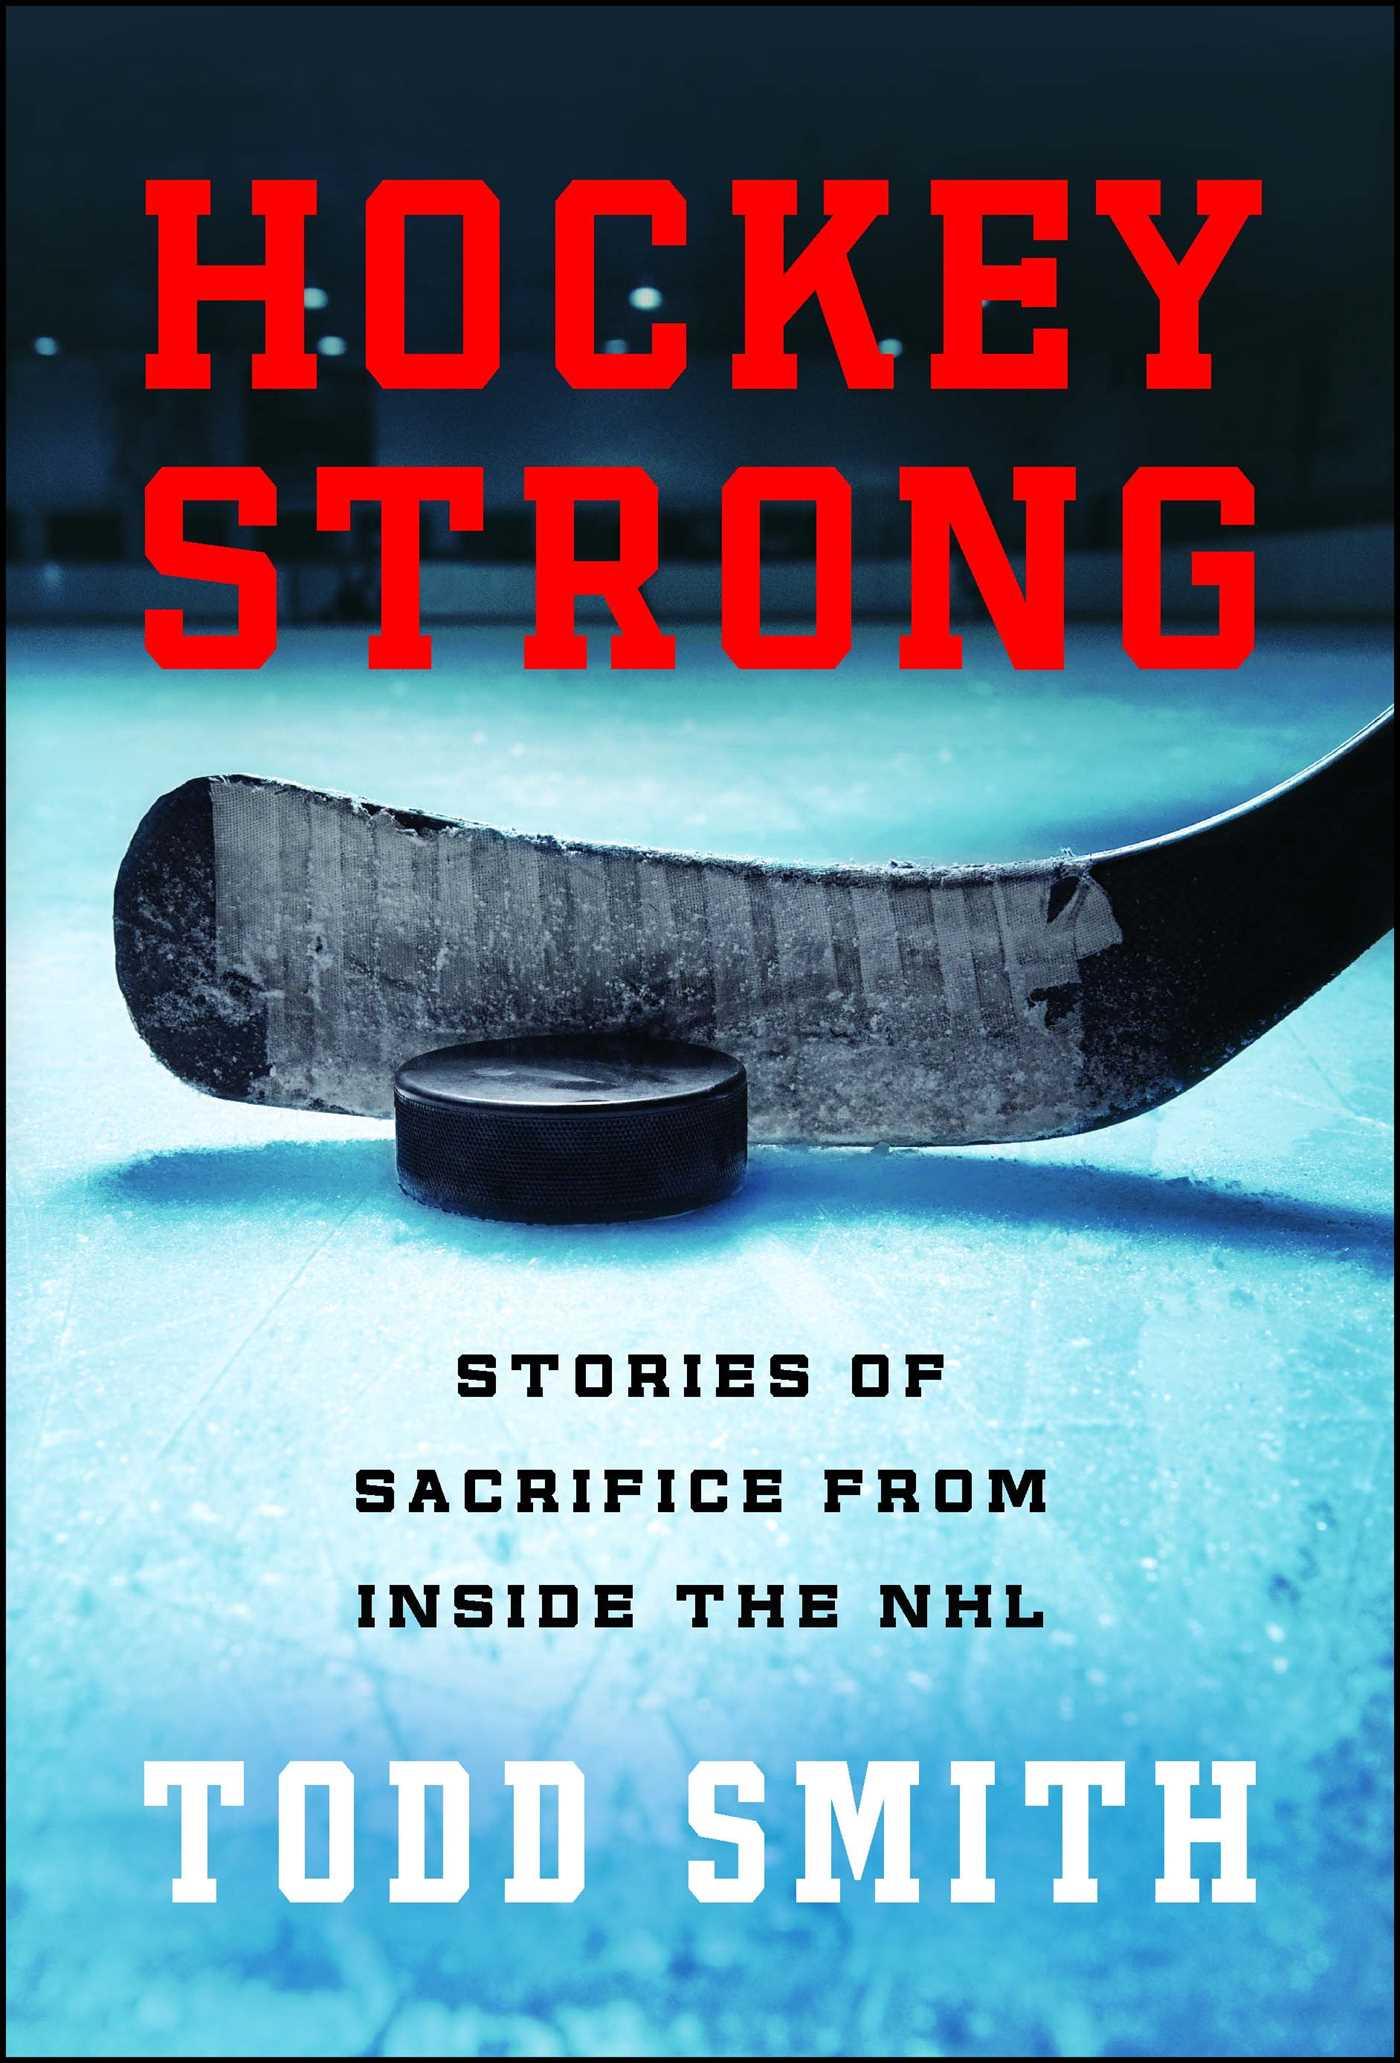 Hockey strong 9781501118371 hr